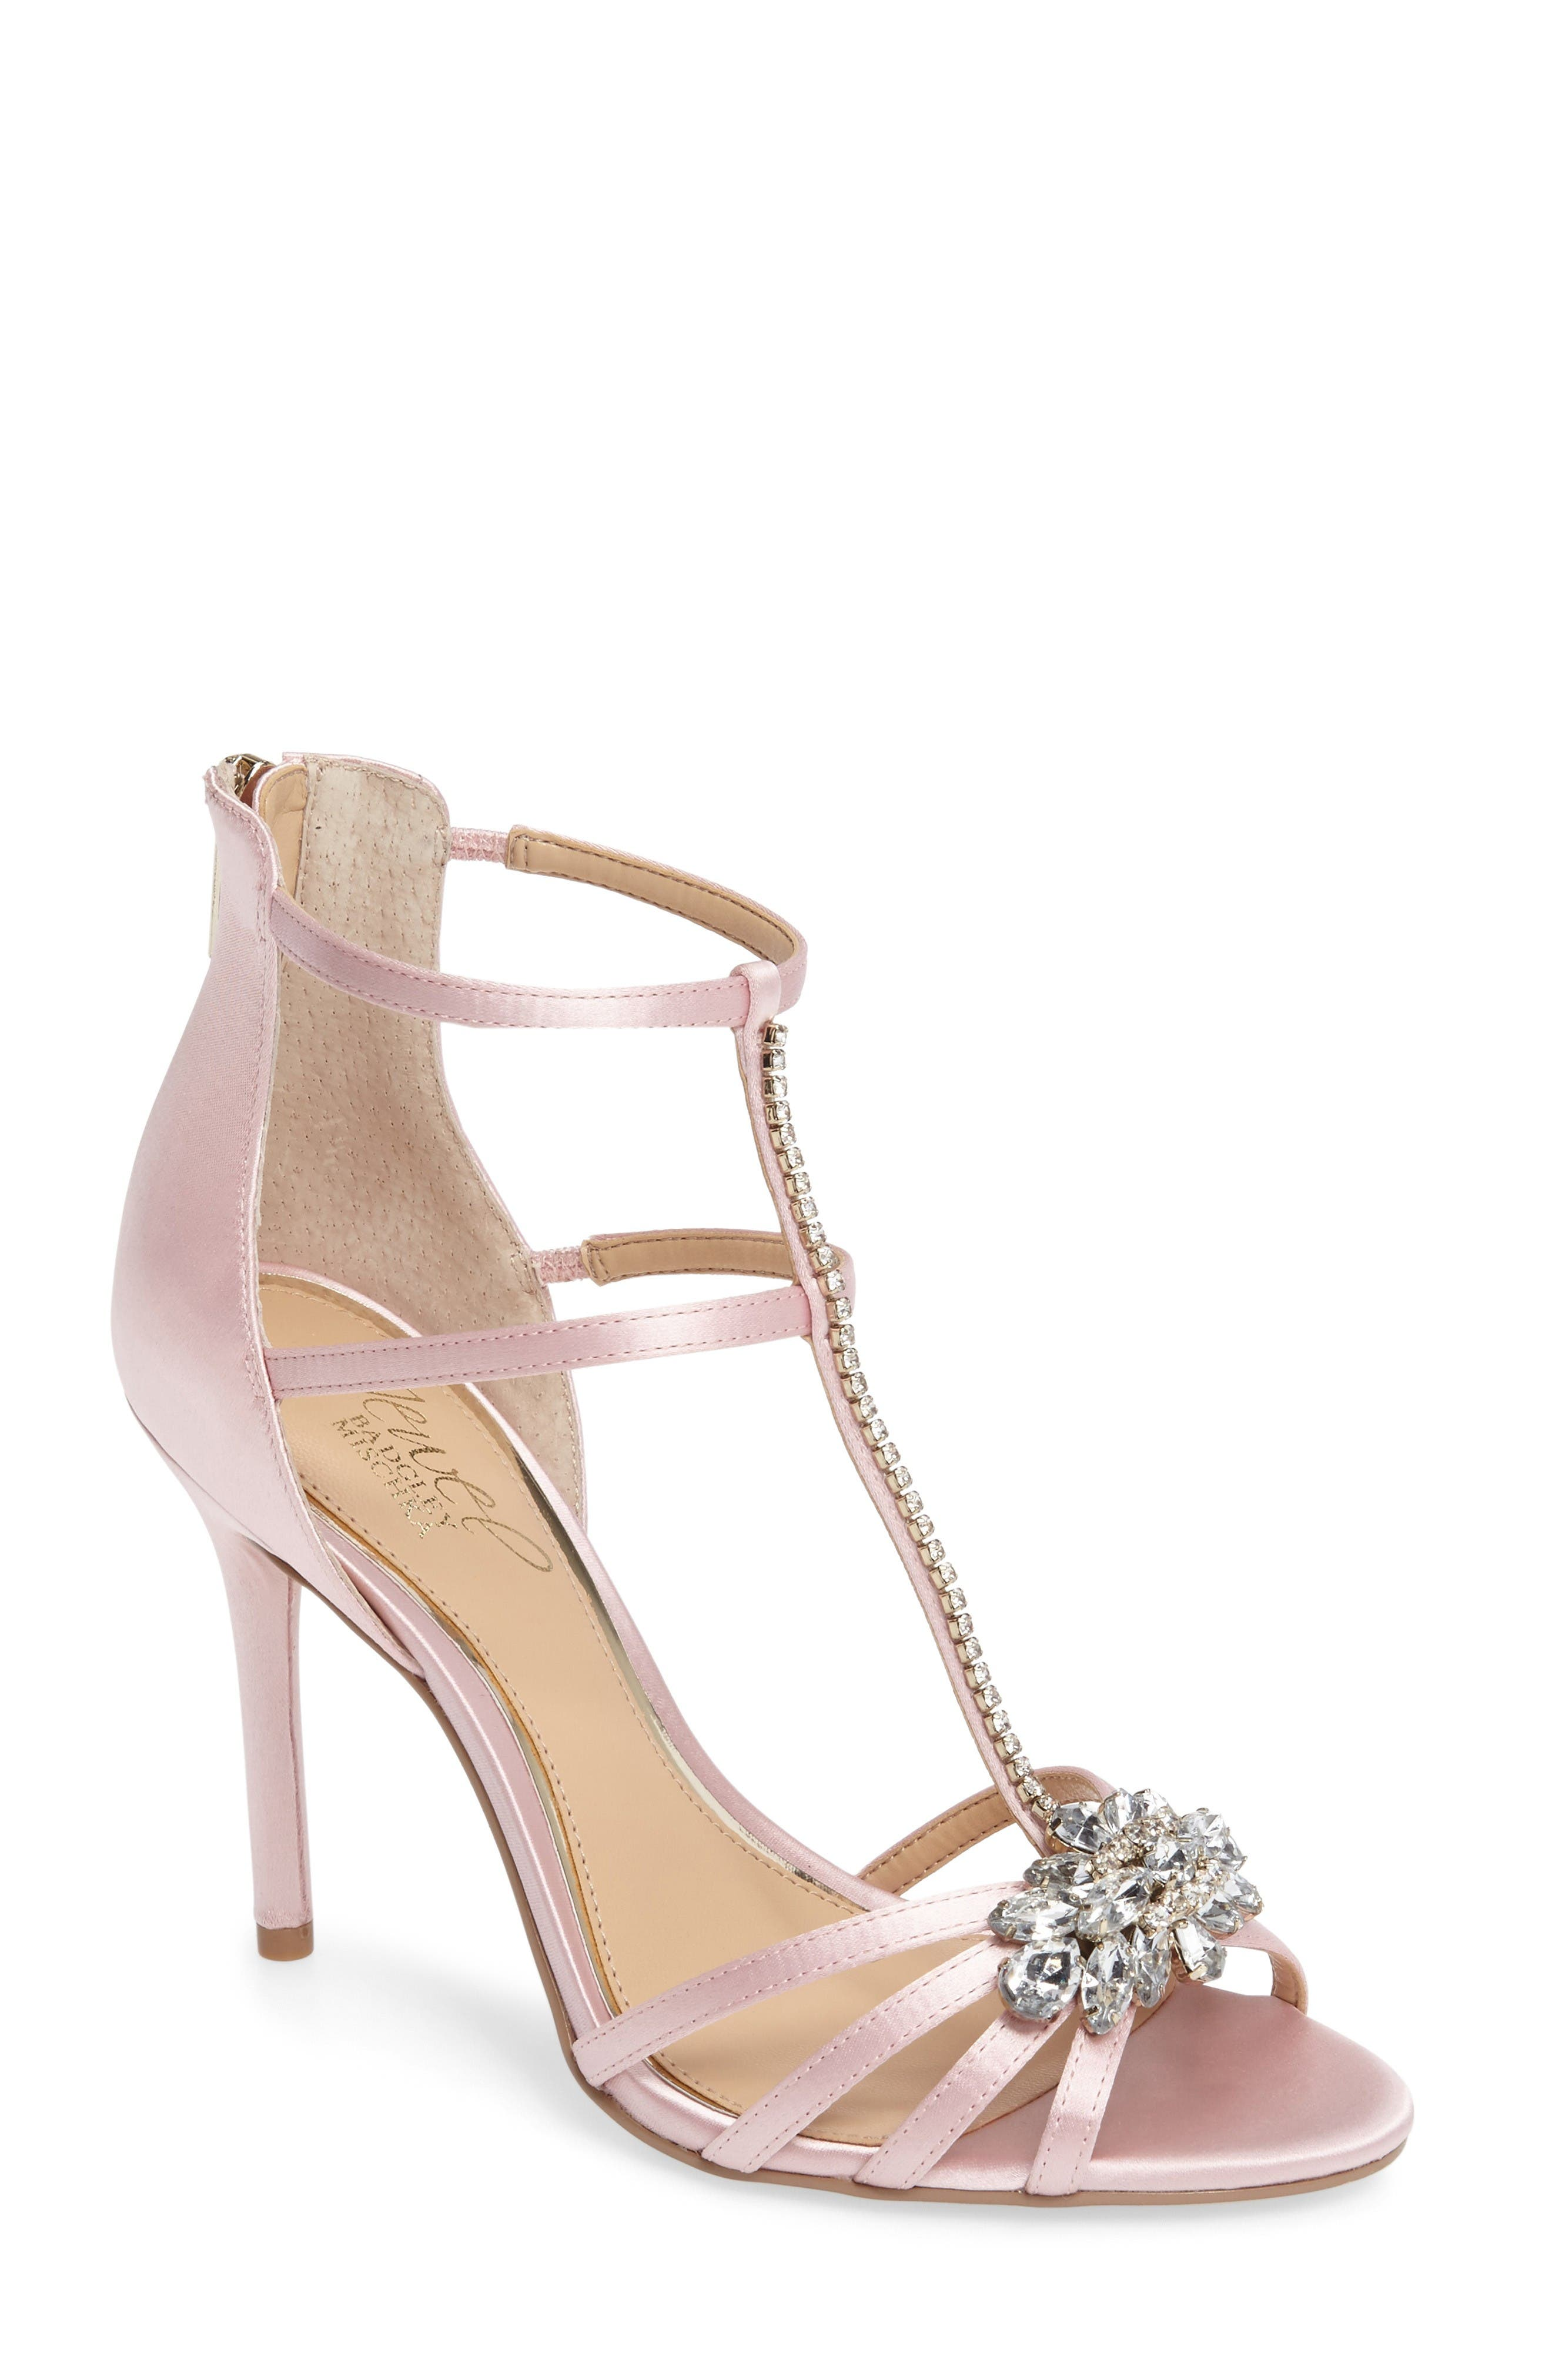 Main Image - Jewel Badgley Mischka Hazel Embellished T-Strap Sandal (Women)